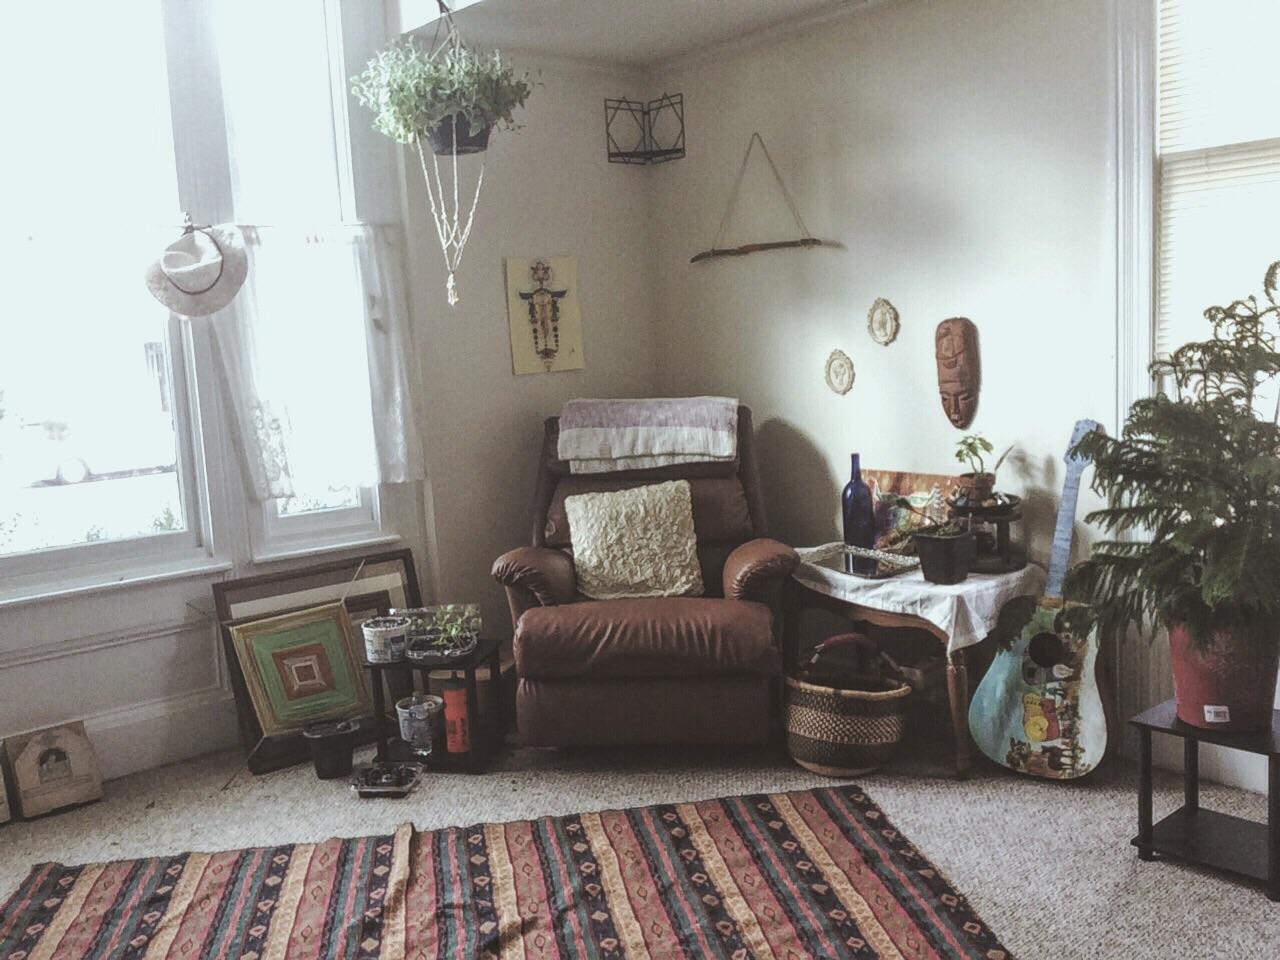 Projects-a-plenty